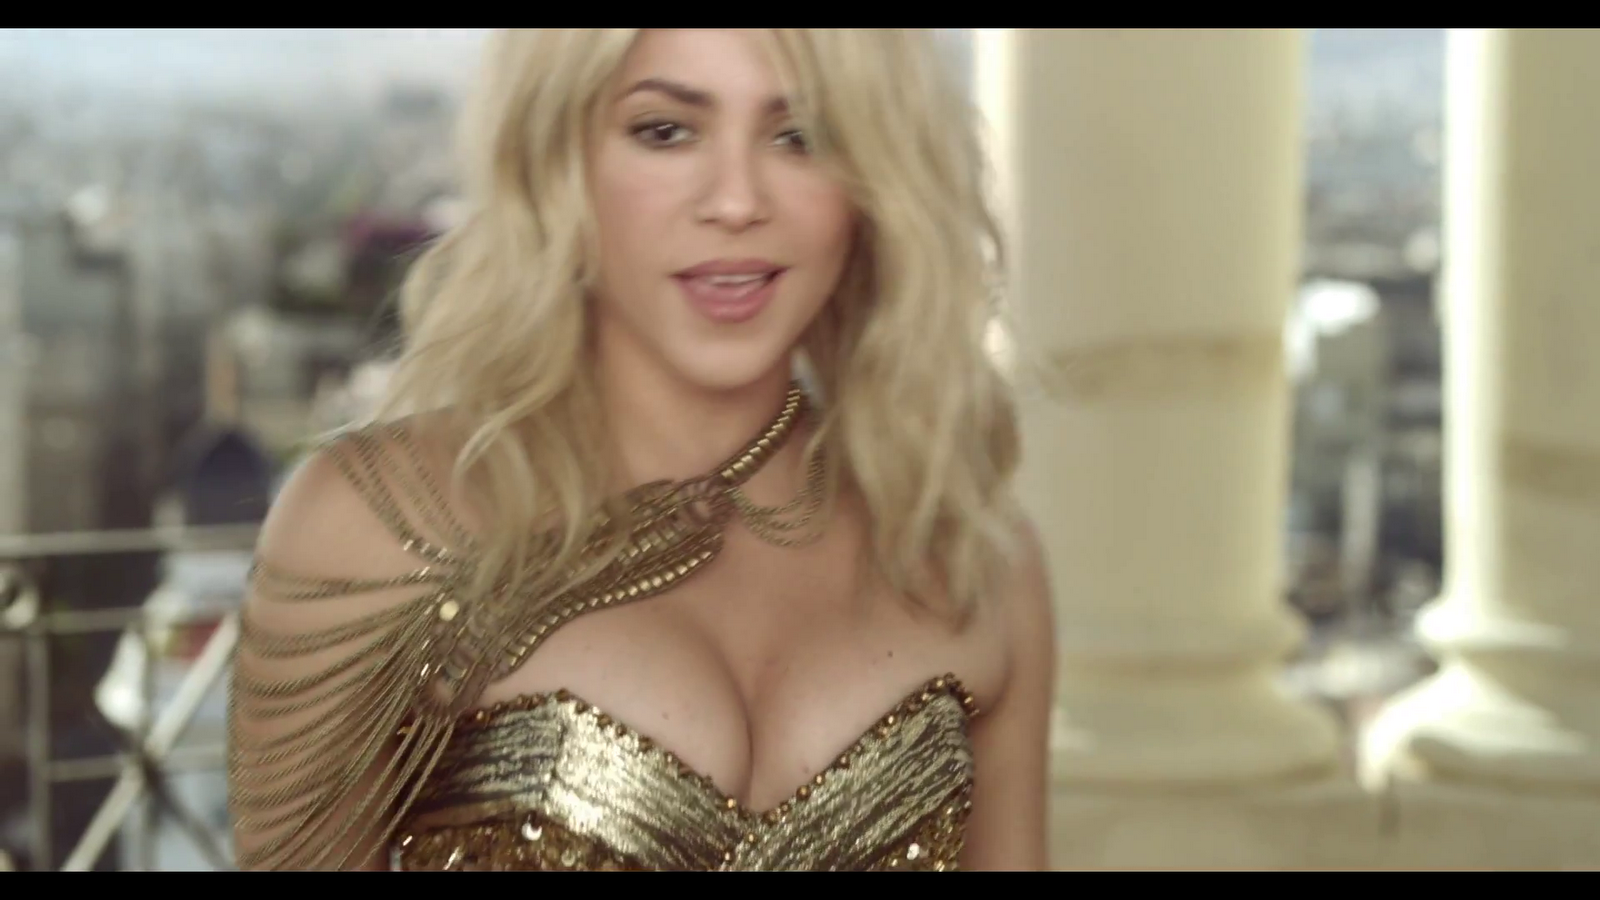 http://4.bp.blogspot.com/-7_t5popBYhY/UBqddeW_RTI/AAAAAAAAKLQ/wPeKTVyCrAY/s1600/Pitbull+-+Get+It+Started+ft.+Shakira.MP4+%252810%2529.png